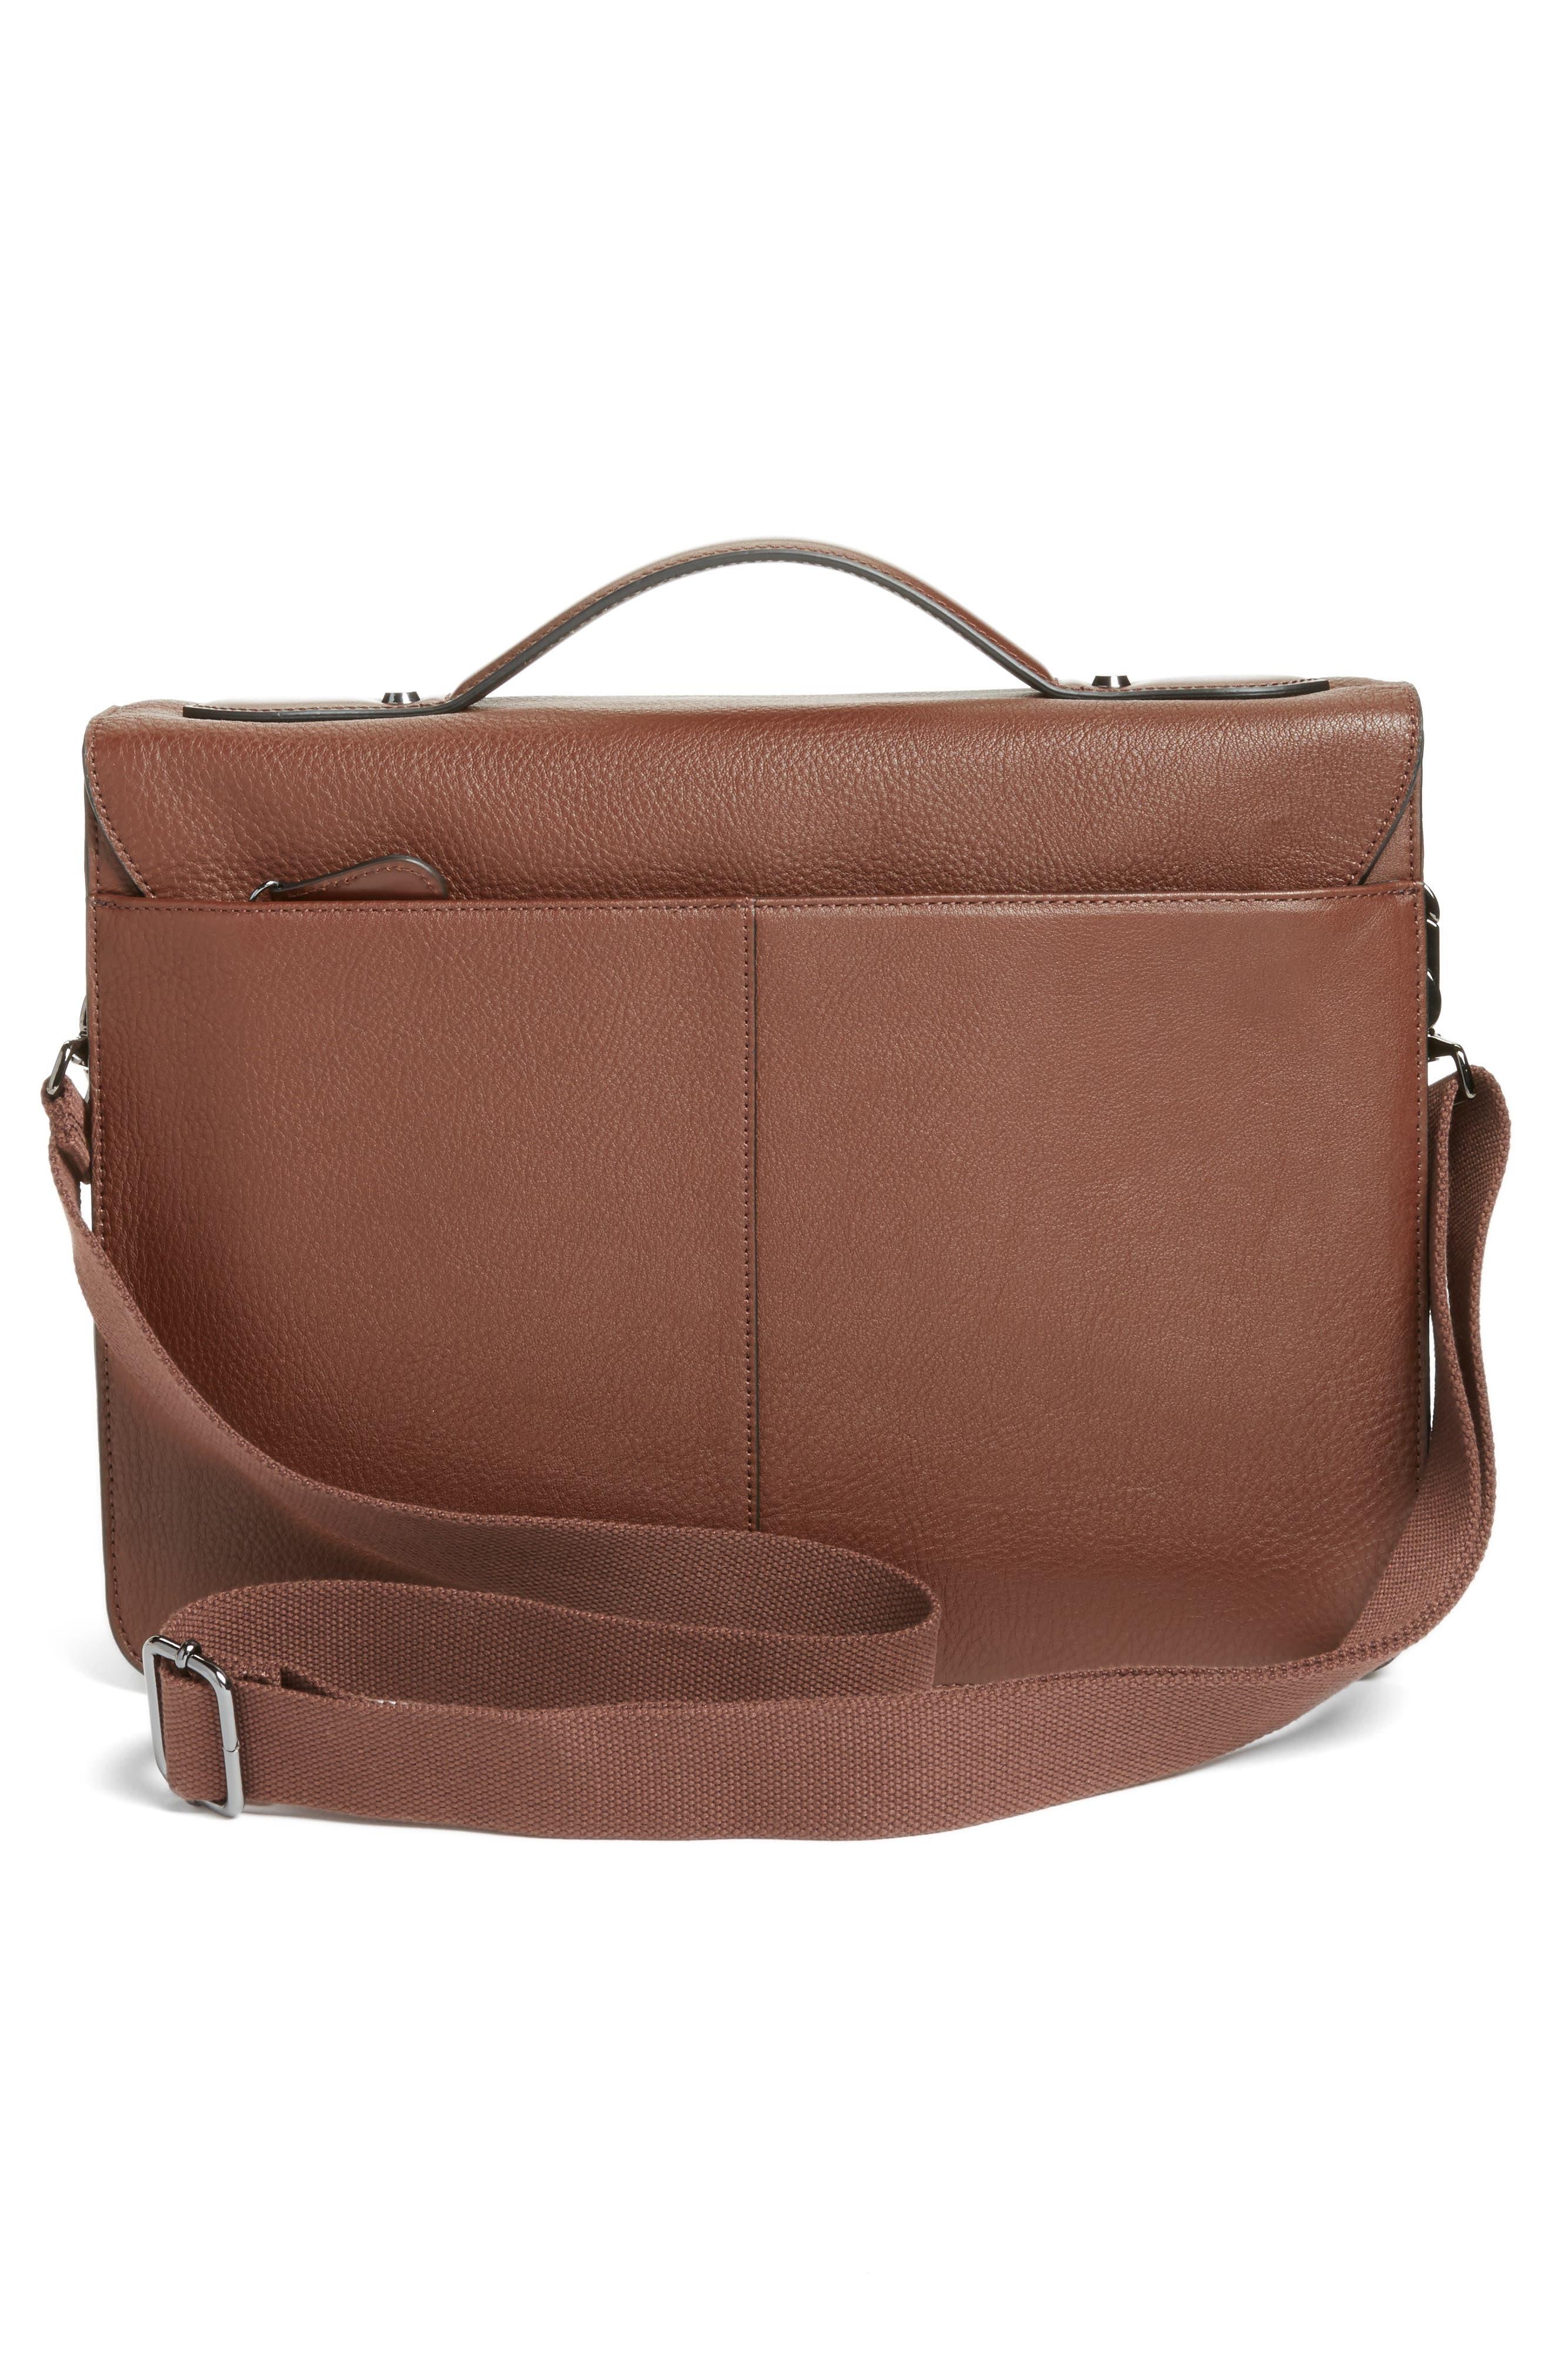 Bengal Leather Satchel,                             Alternate thumbnail 6, color,